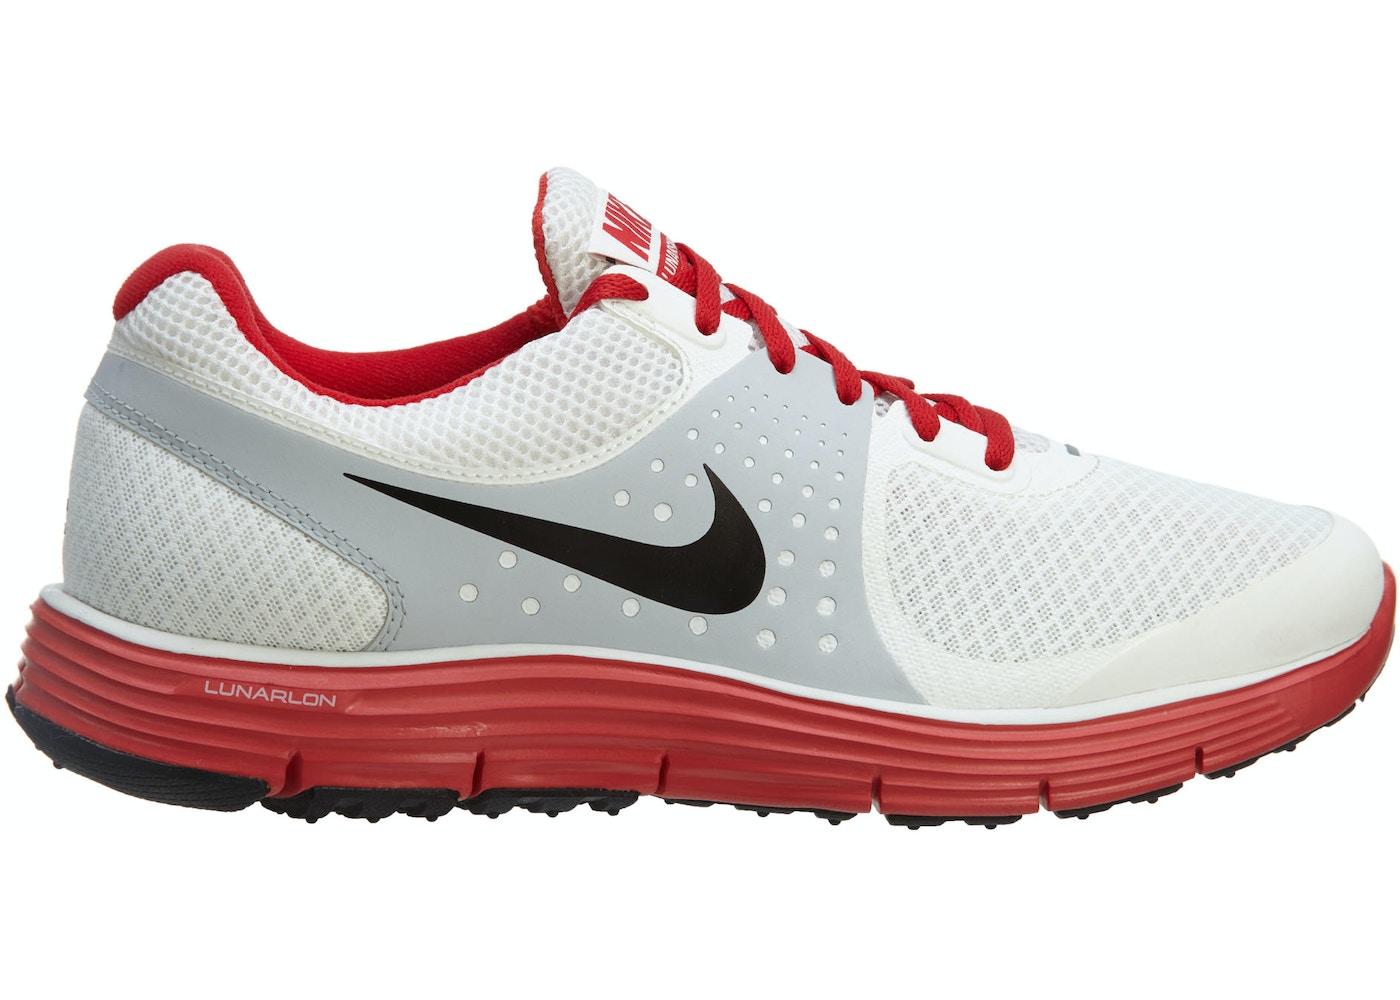 Escándalo elefante atleta  Nike Lunarswift+4 Red/White/Black - 510787-100